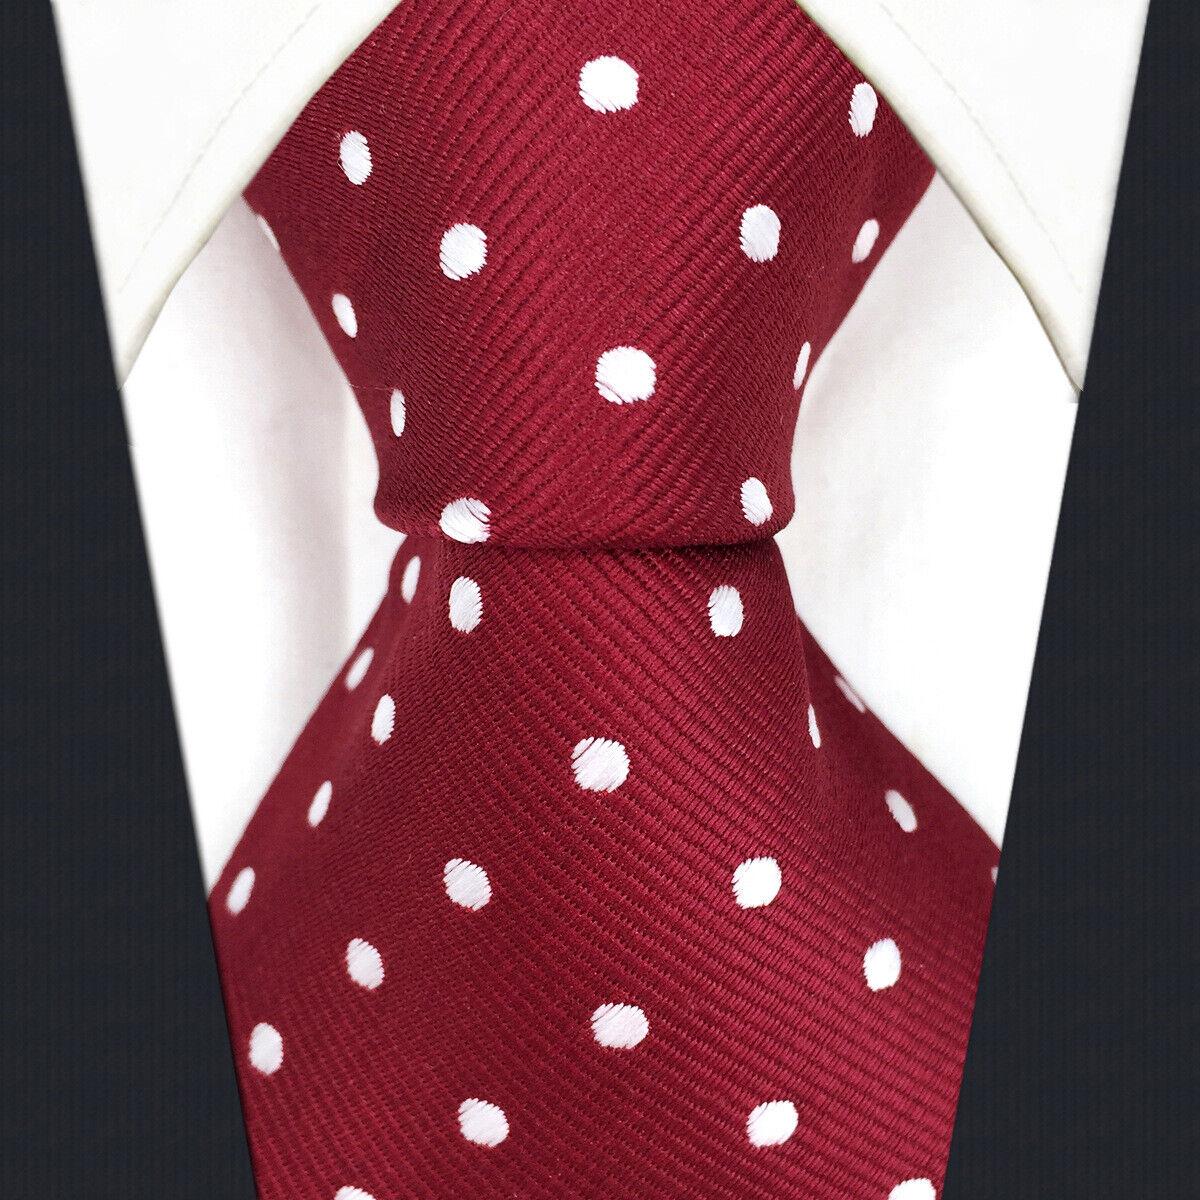 S15 Men's Tie Silk Extra Long Size Dots Red Crimson Classic Design Wedding New